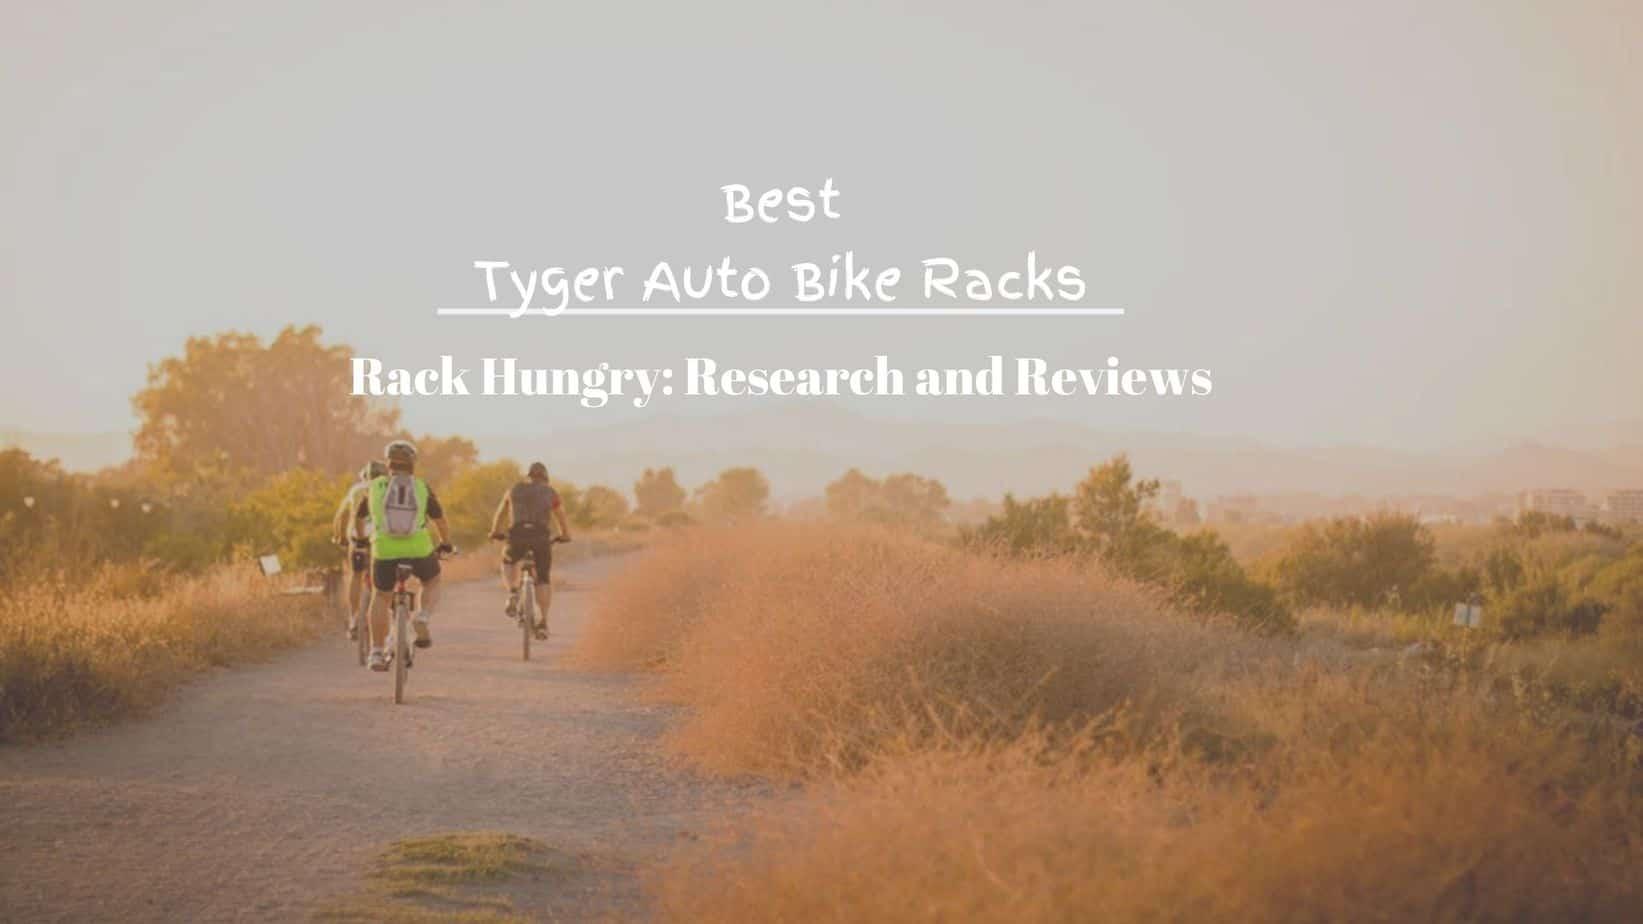 best tyger auto bike racks